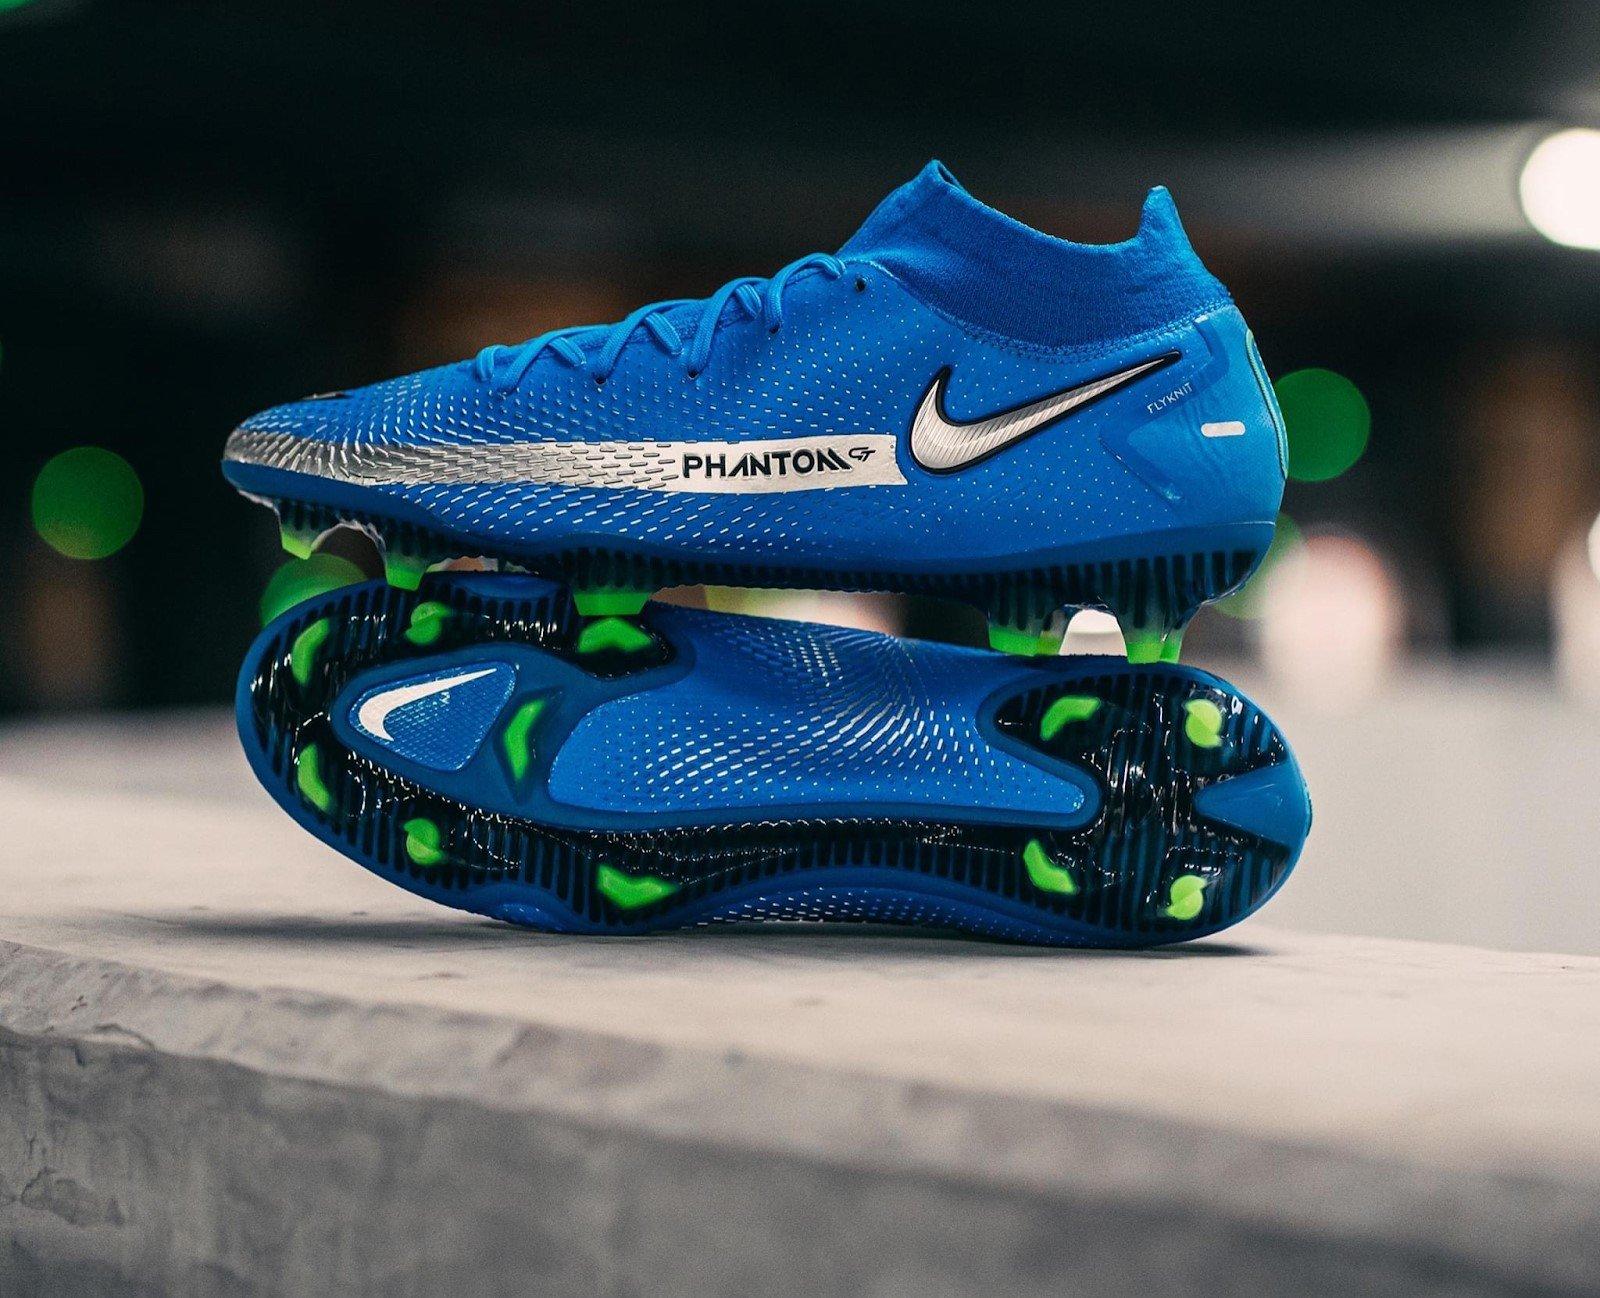 Giày đá bóng Nike Phantom Gt